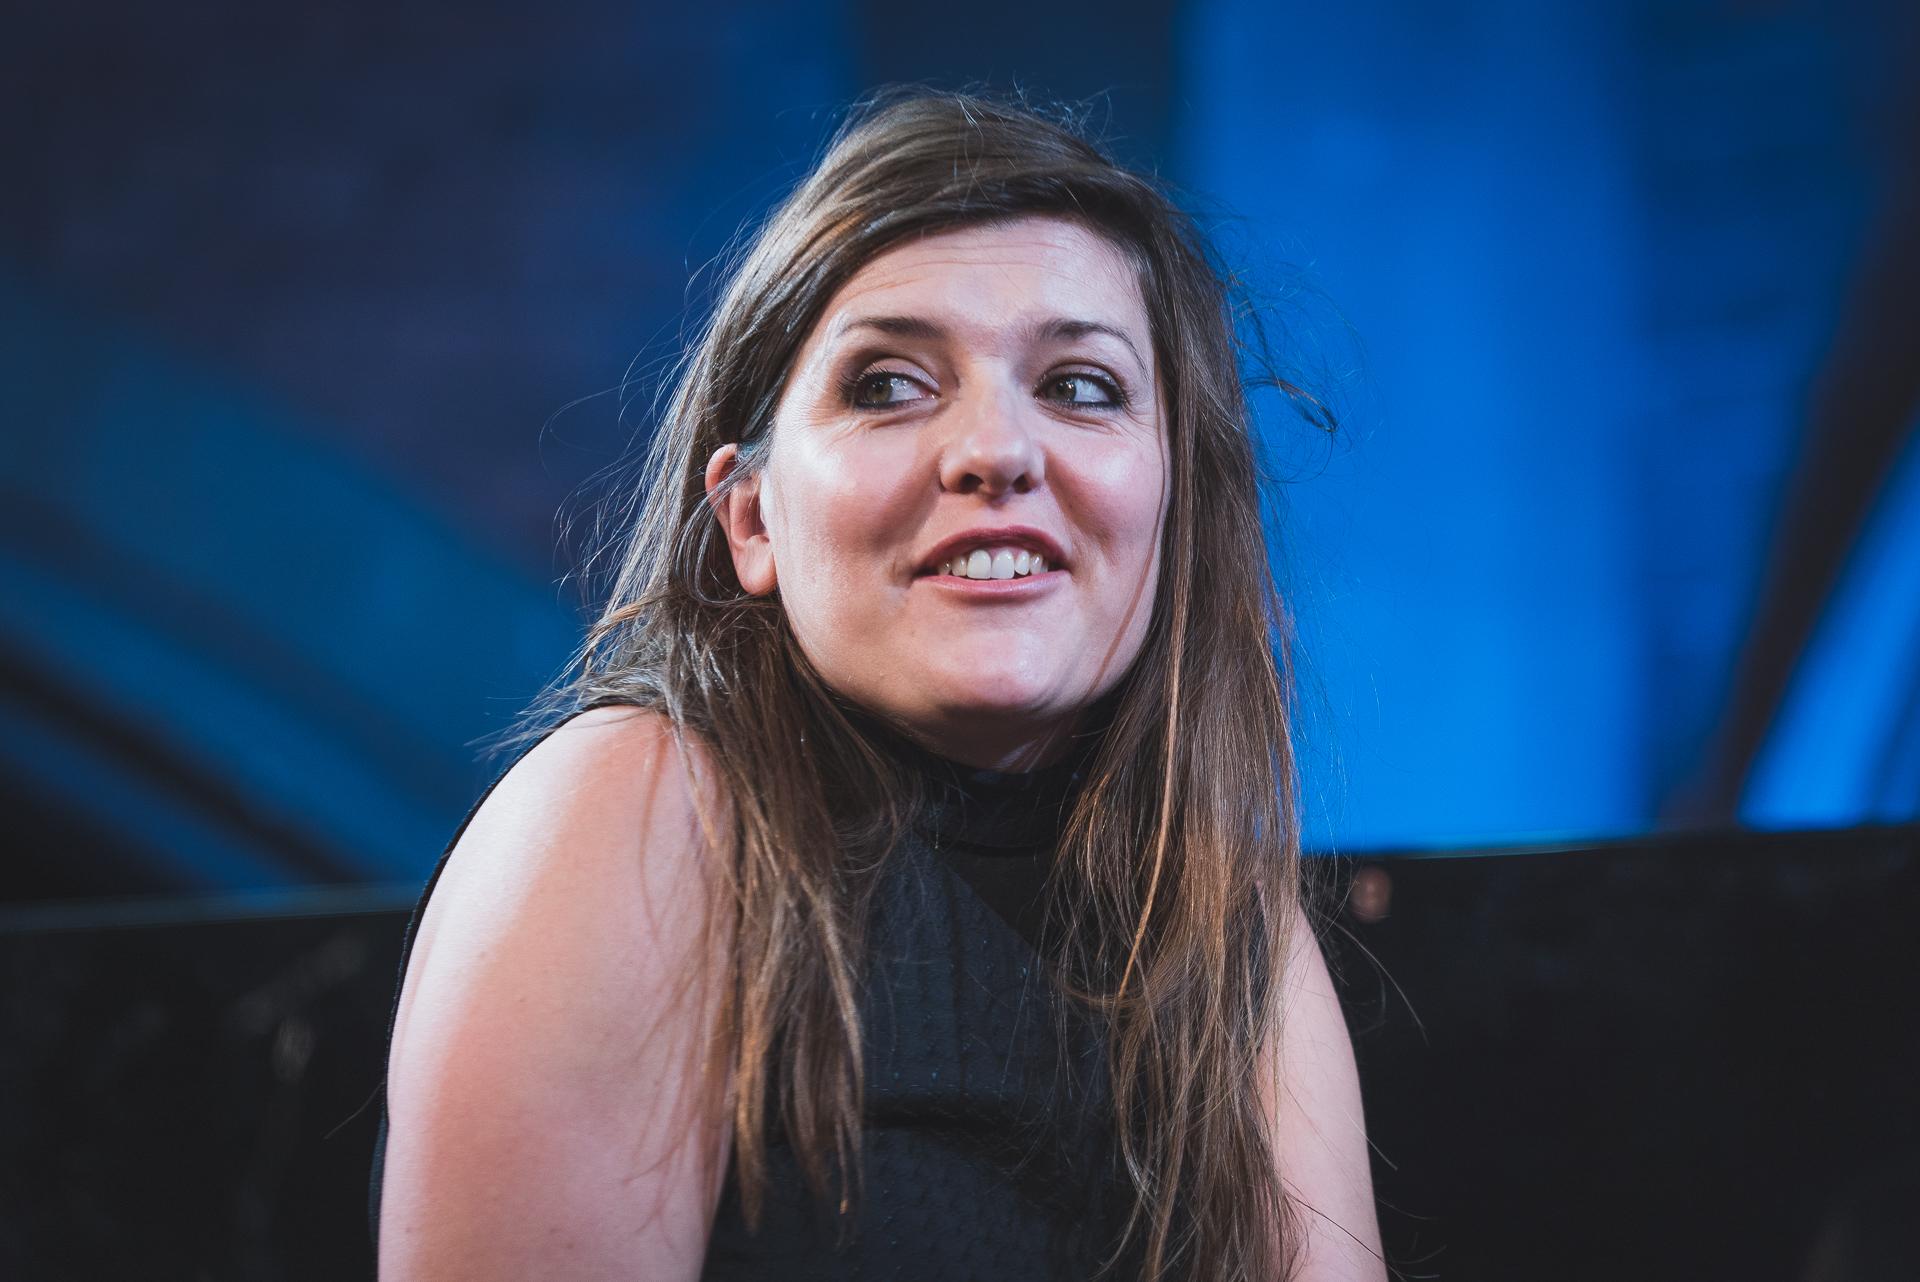 Daylight Music 254: Melissa Parmenter